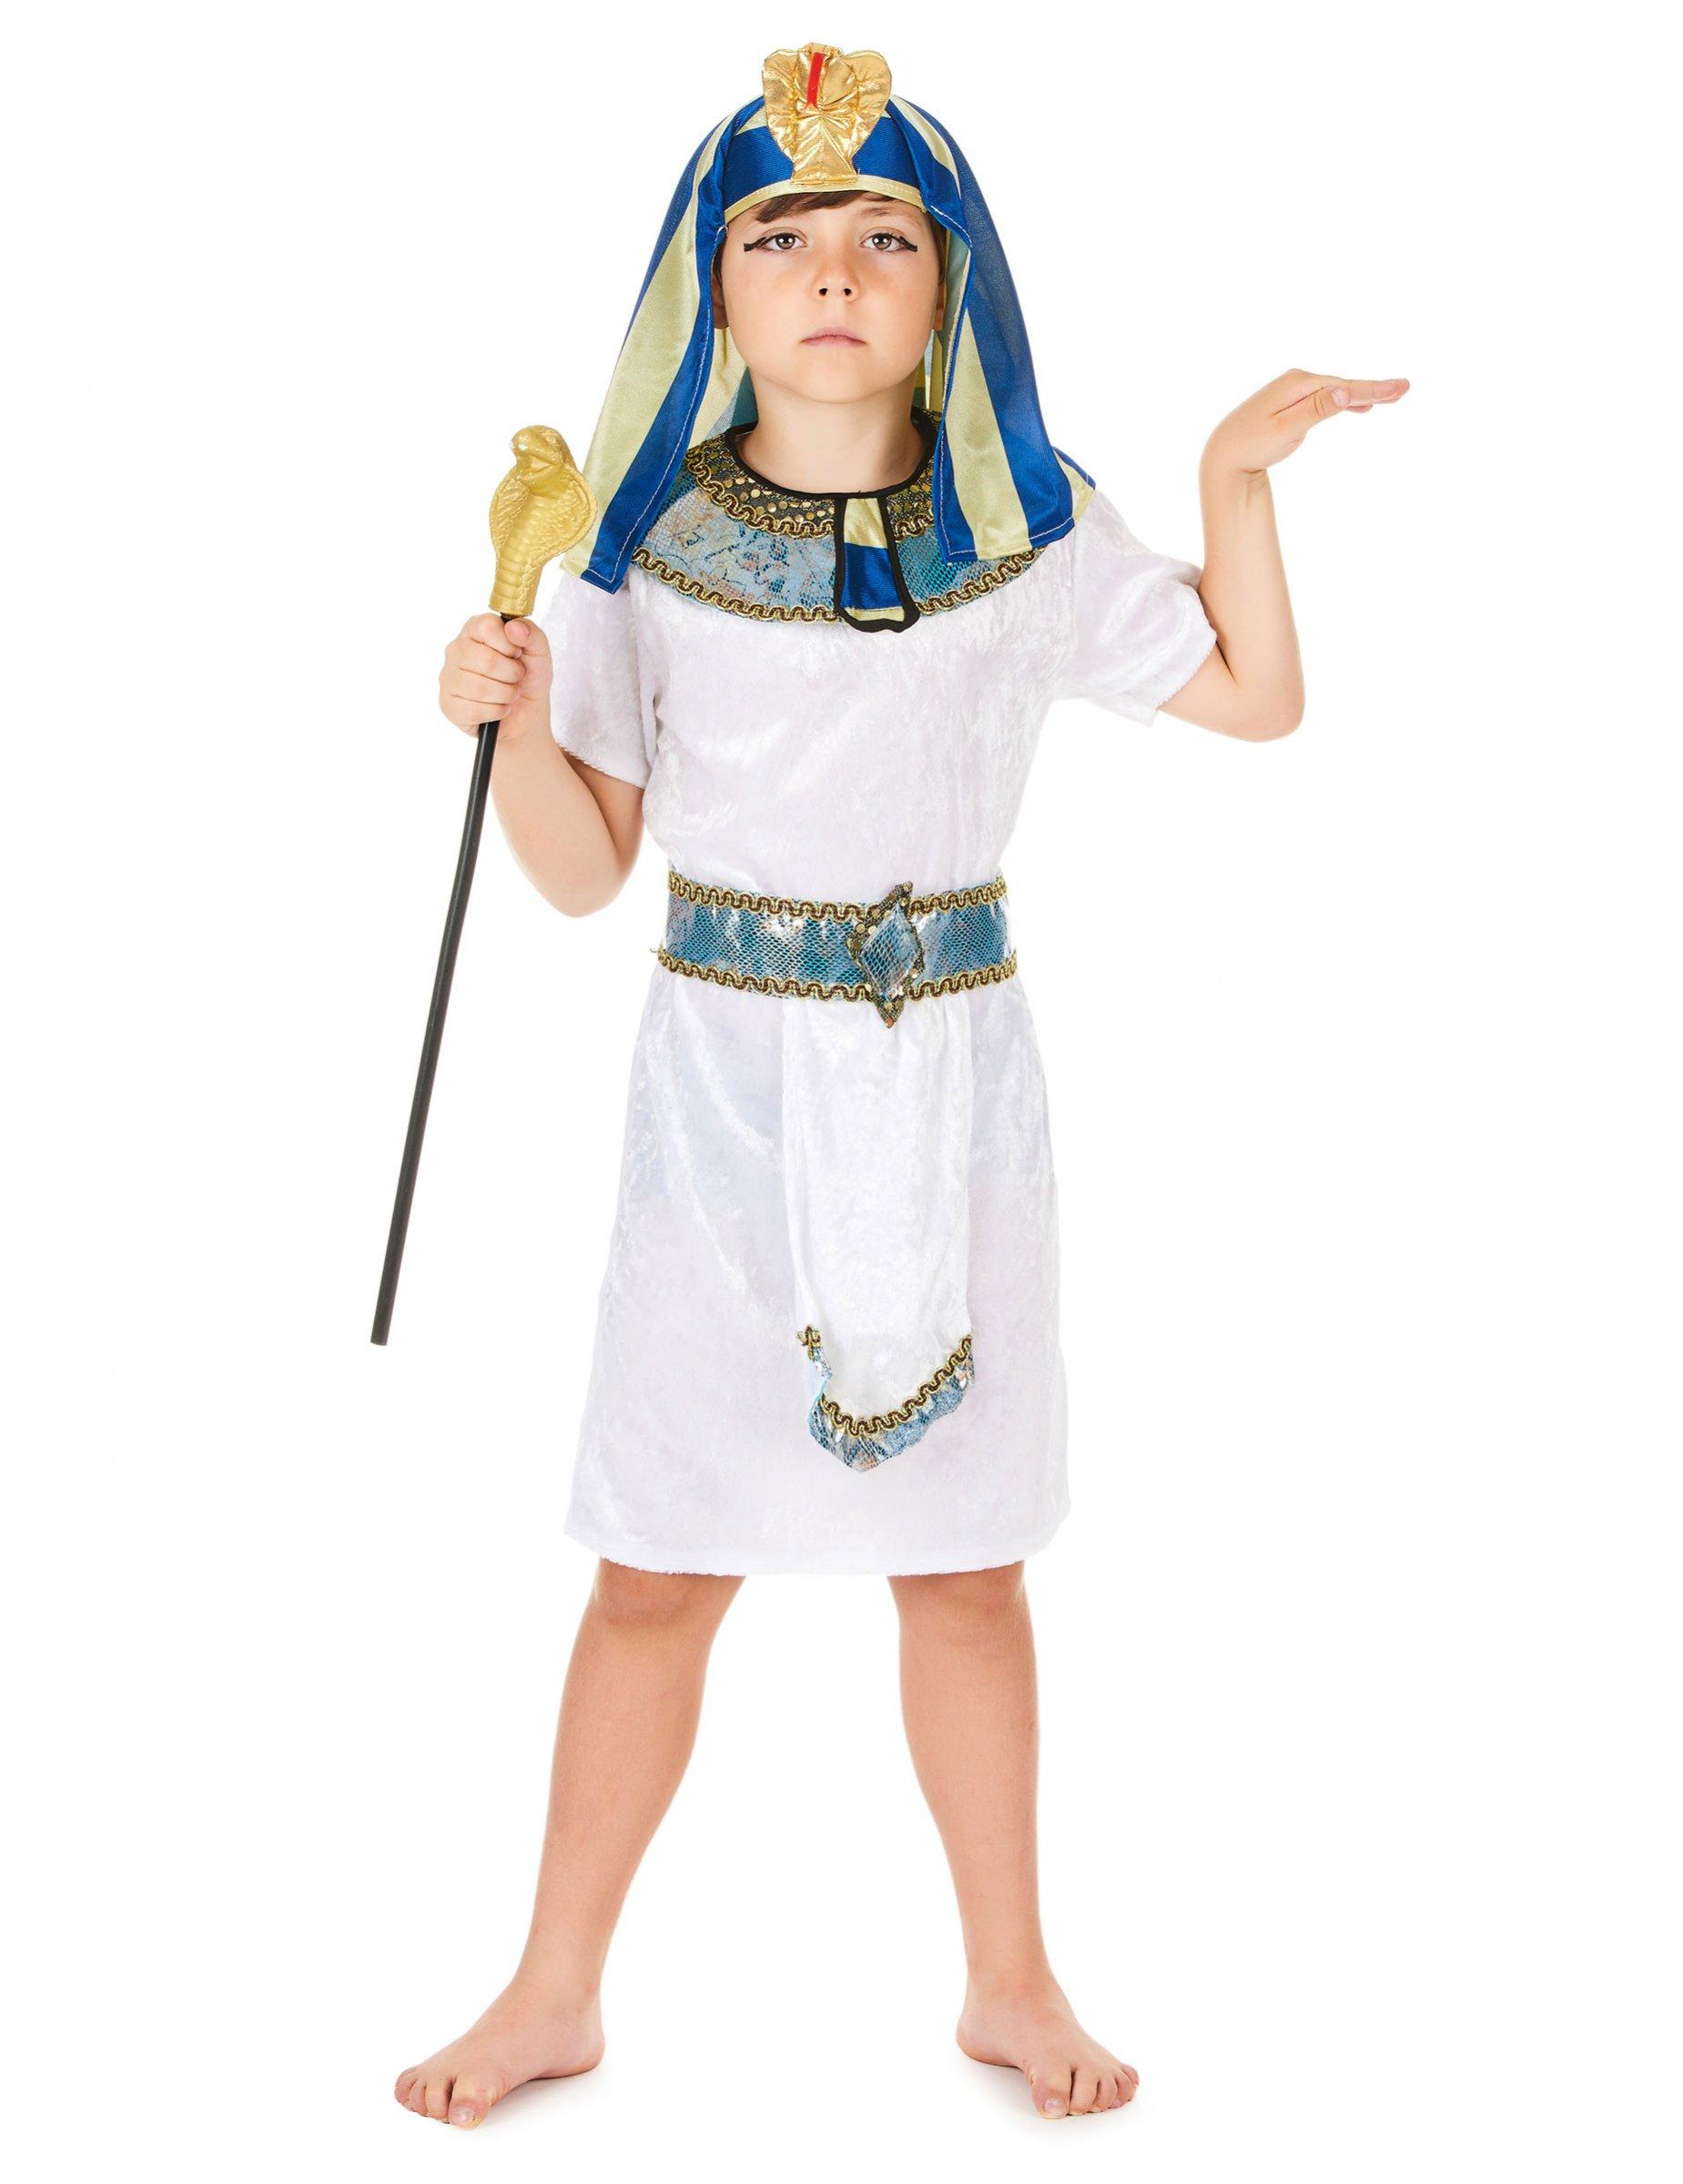 gyptischer pharao kost m f r jungen kost me f r kinder und g nstige faschingskost me vegaoo. Black Bedroom Furniture Sets. Home Design Ideas